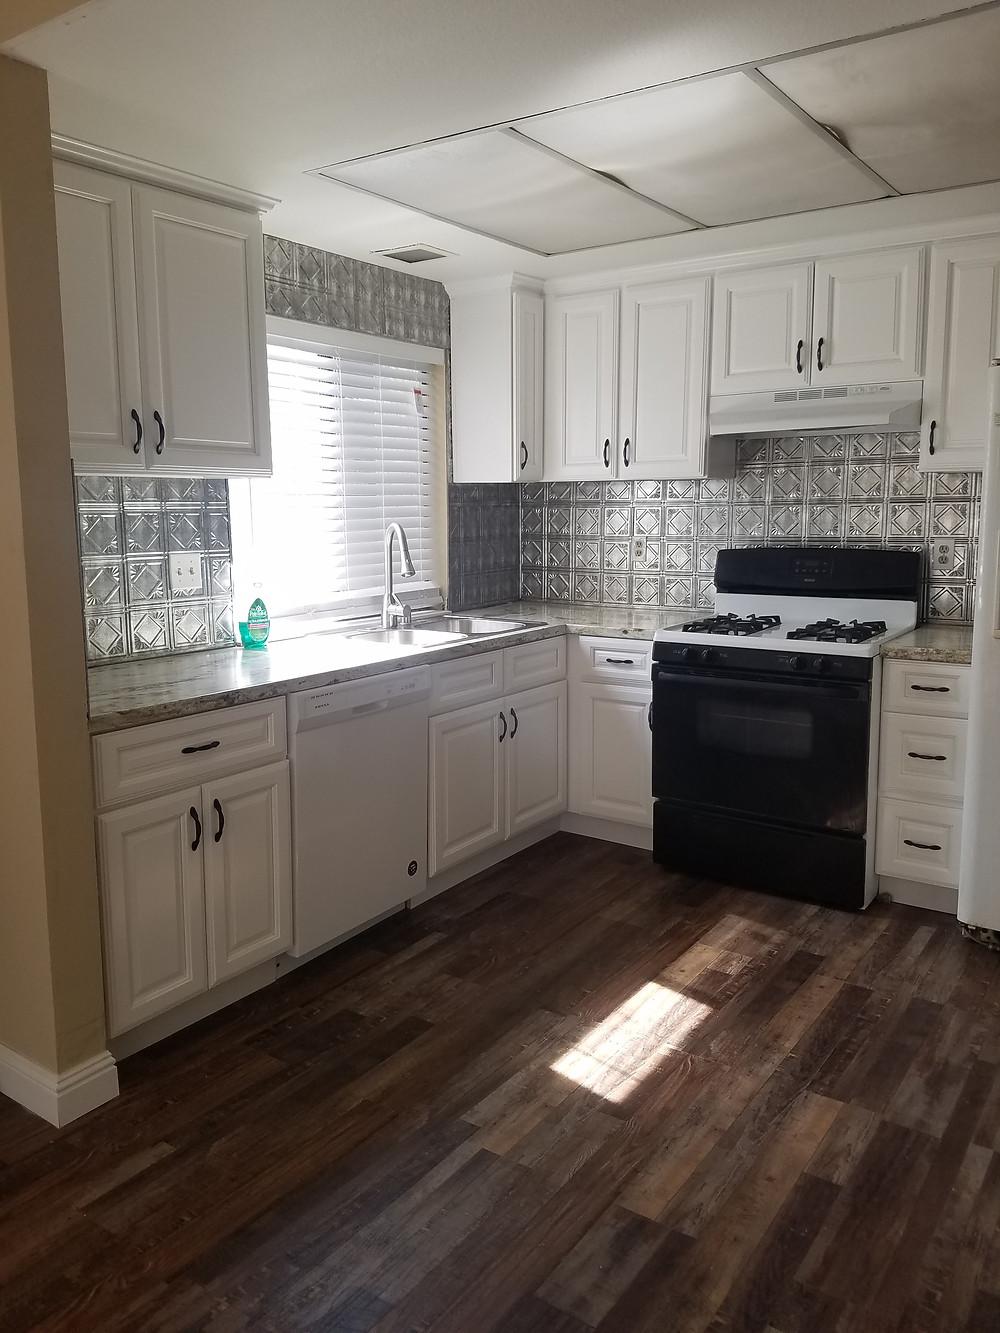 #Integritywoodworking #orangecountyca #kitchen #installation #kitchencabinets #cabinetinstallation #whitecabinets #remodel #kitchenremodel